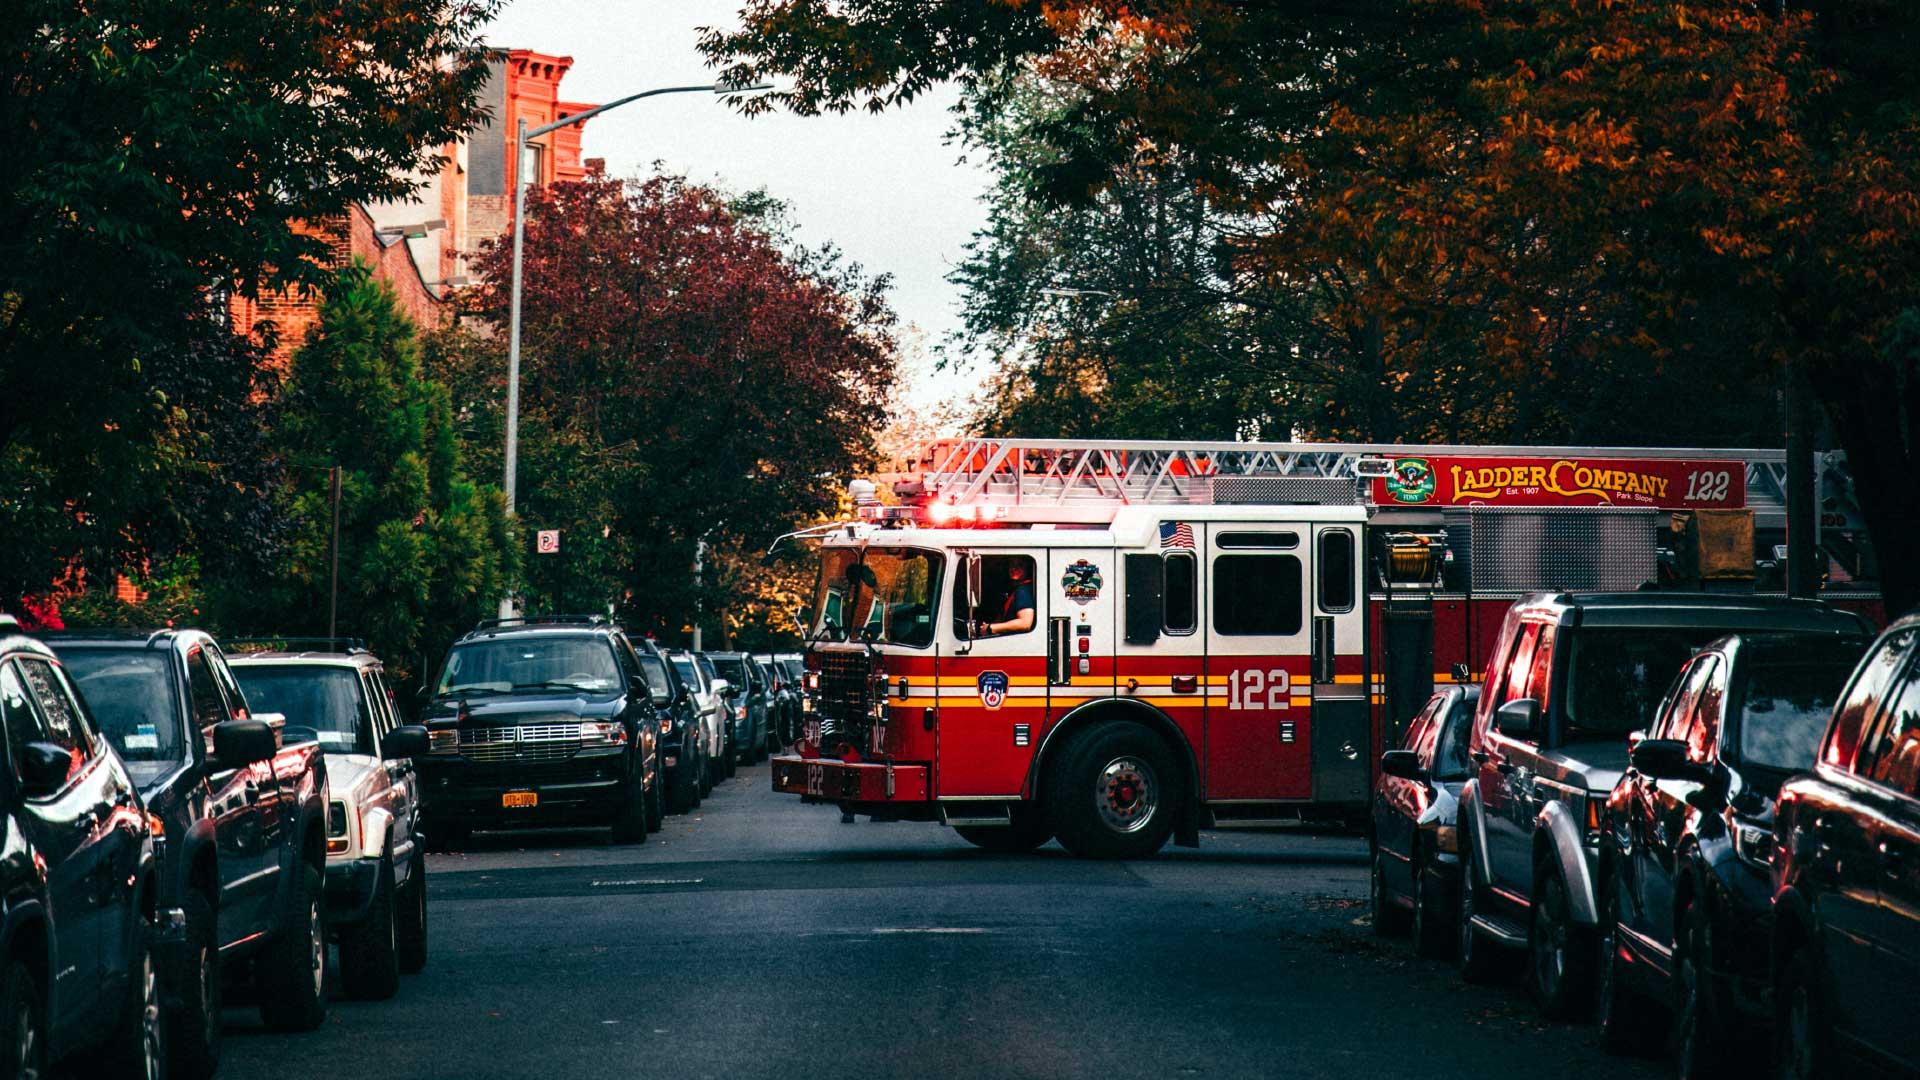 Fire disaster preparedness